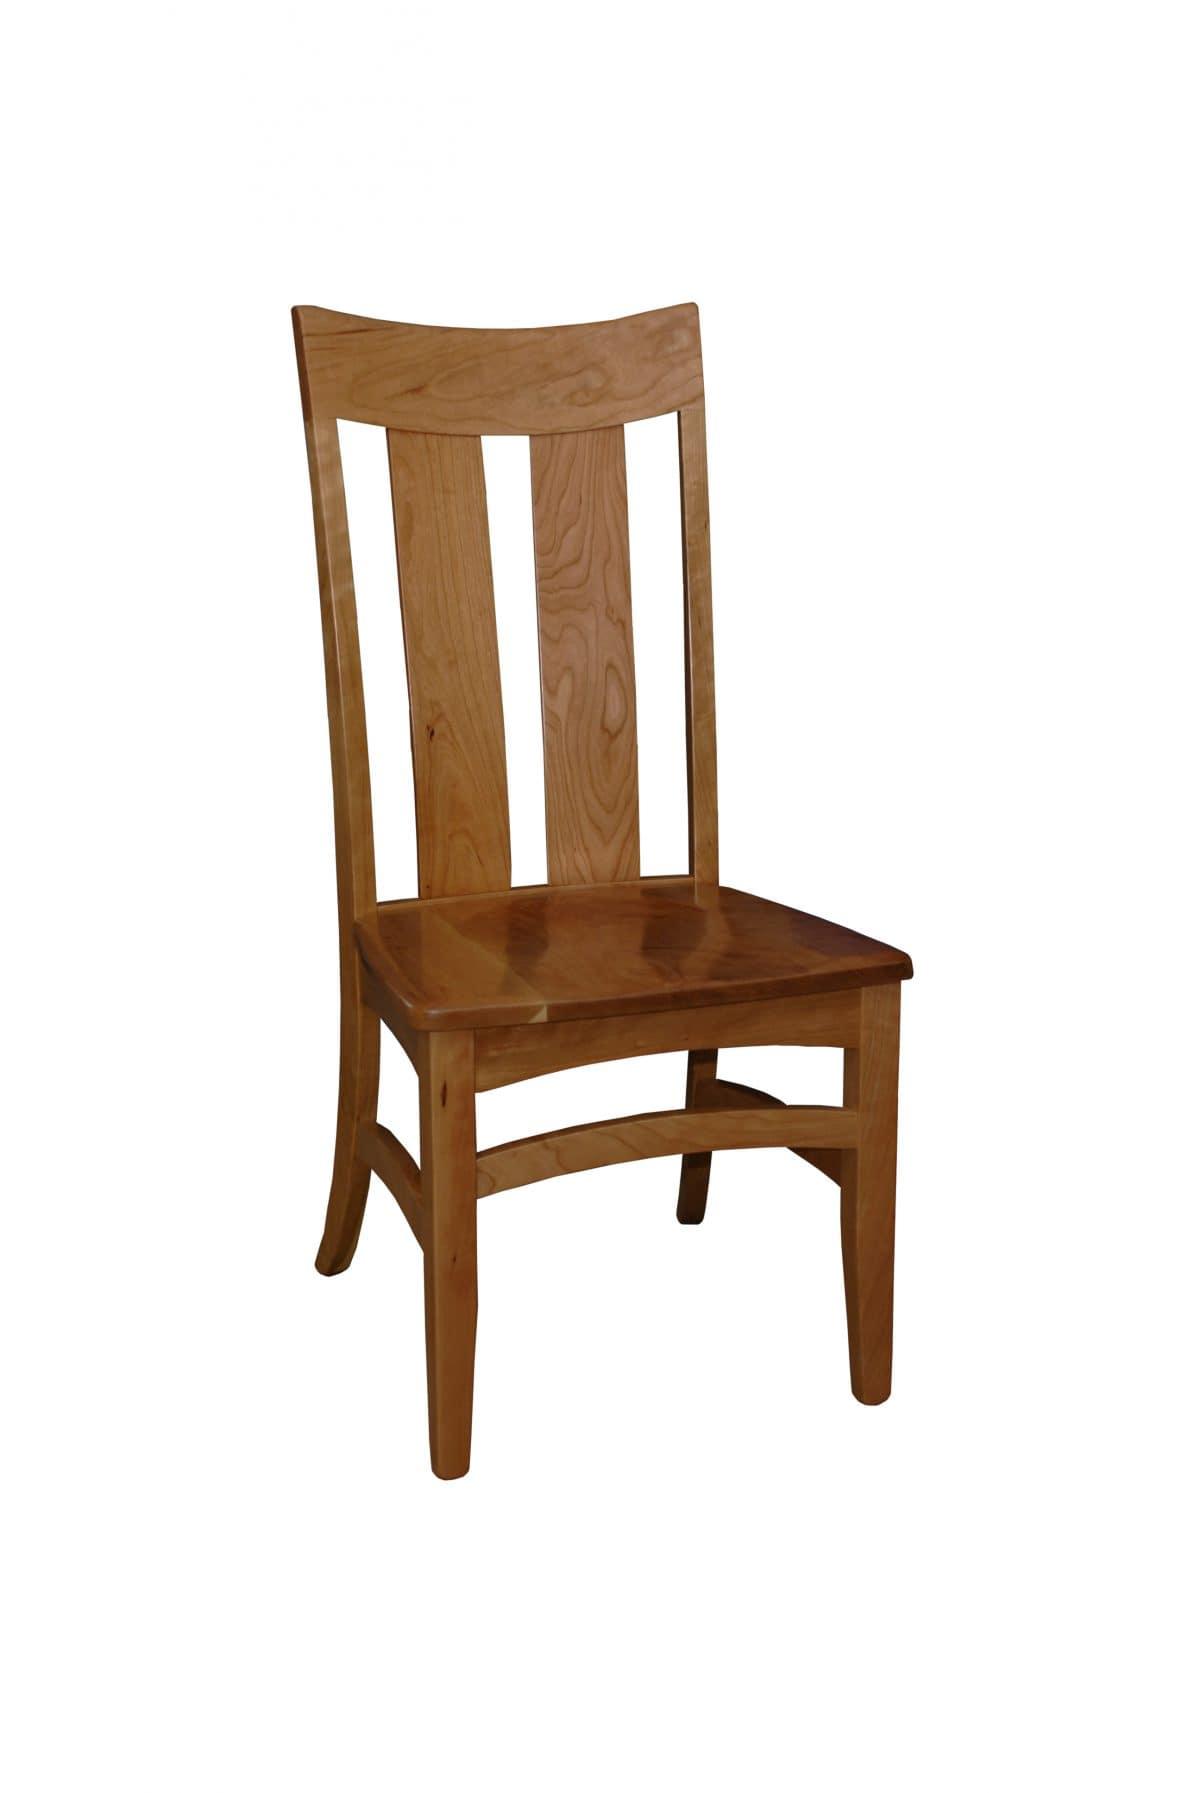 Photo of: BW Galveston Shaker Side Chair